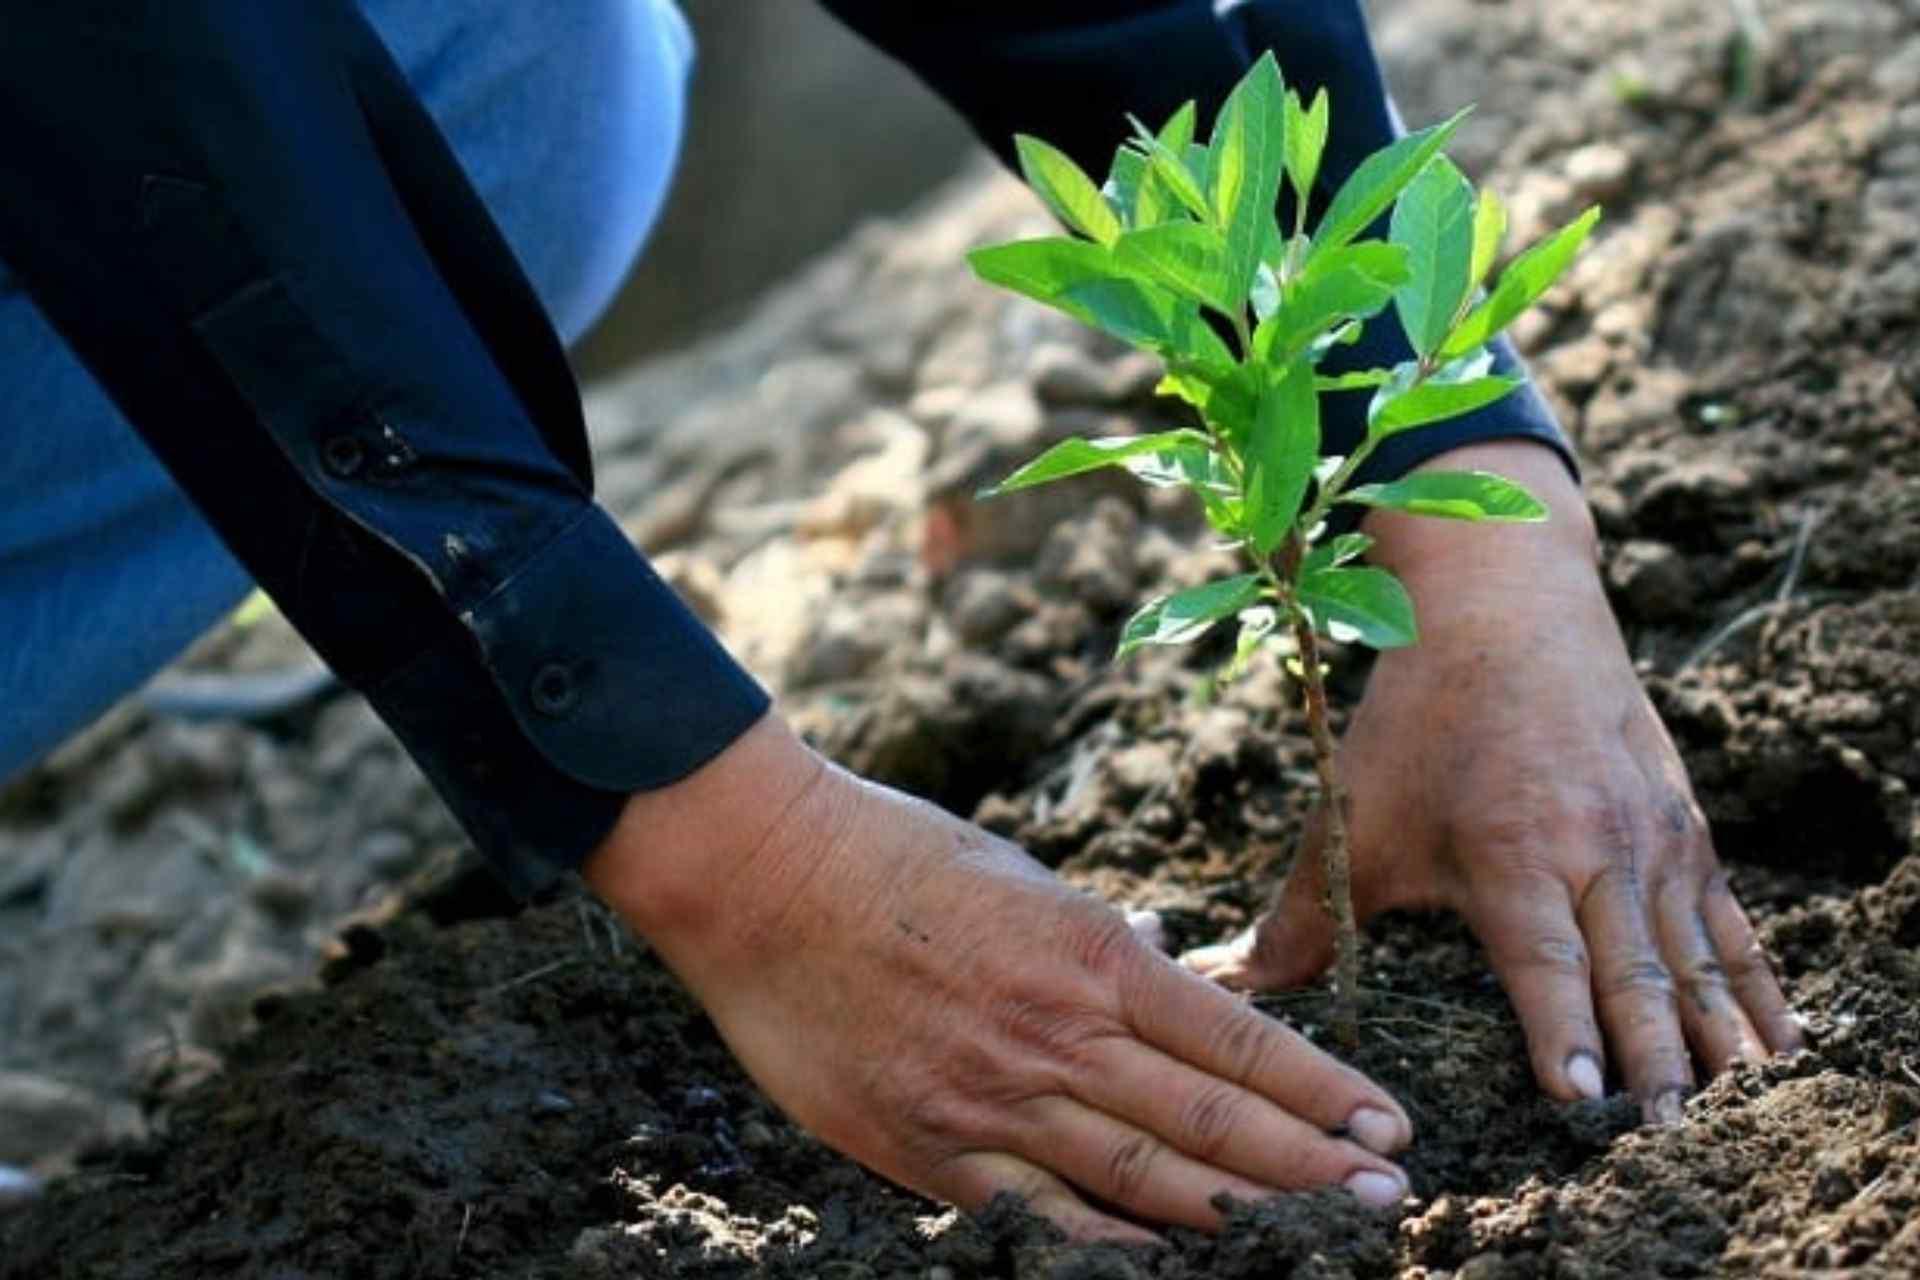 árboles-reforestación-índice de mortanda-ecología-CCE-Tlaxcala